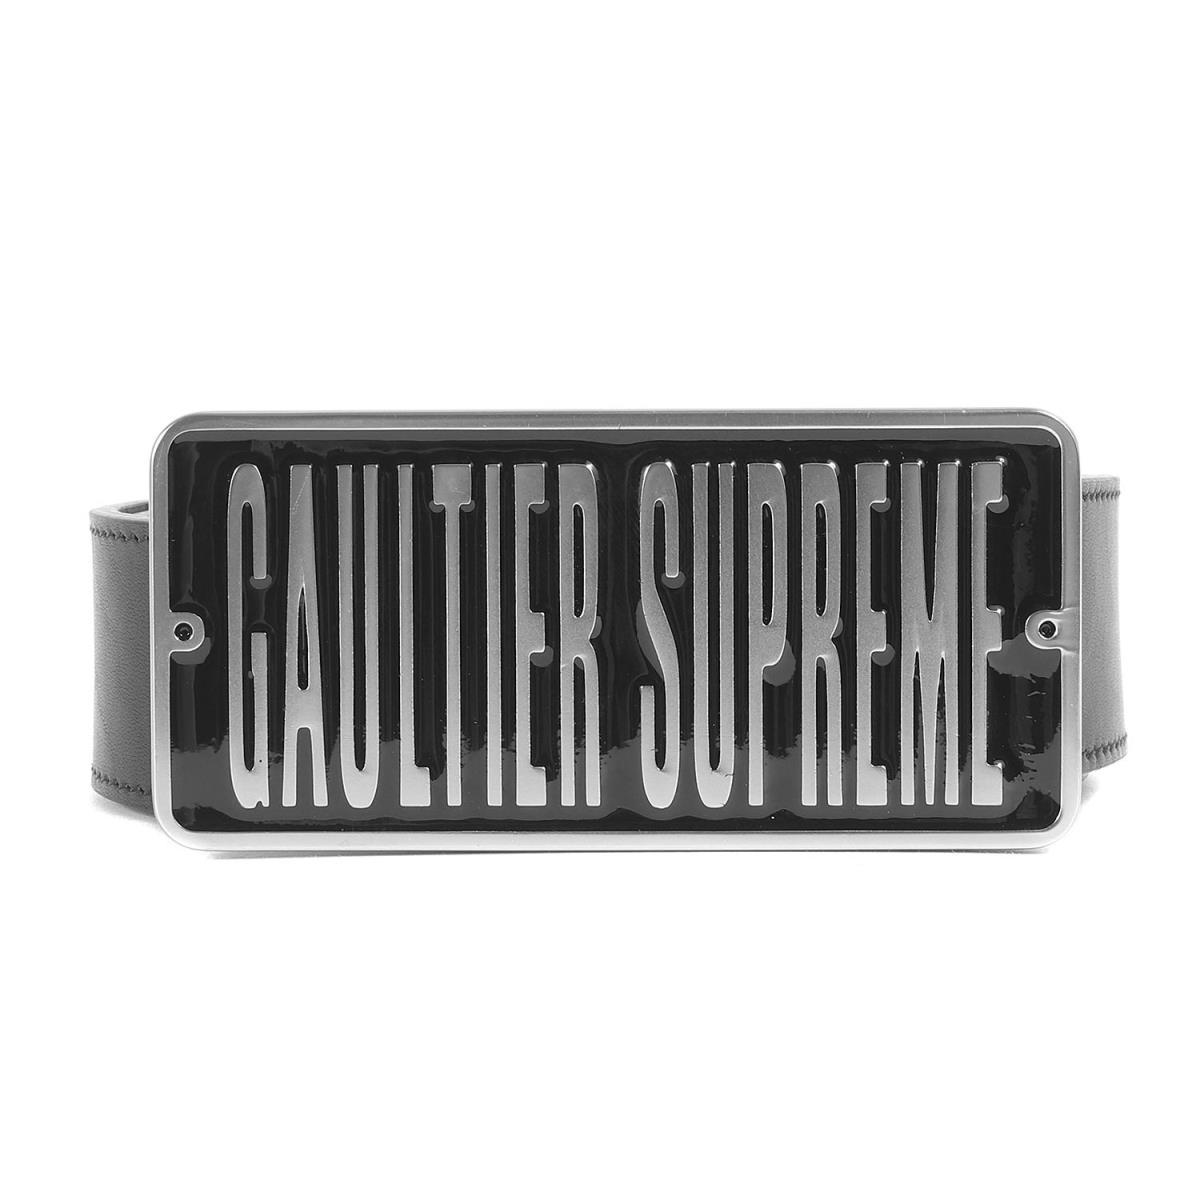 Supreme シュプリーム ベルト 19SS Jean Paul Gaultier ロゴバックルレザーベルト Belt ブラック S/M 【メンズ】【中古】【美品】【K2499】